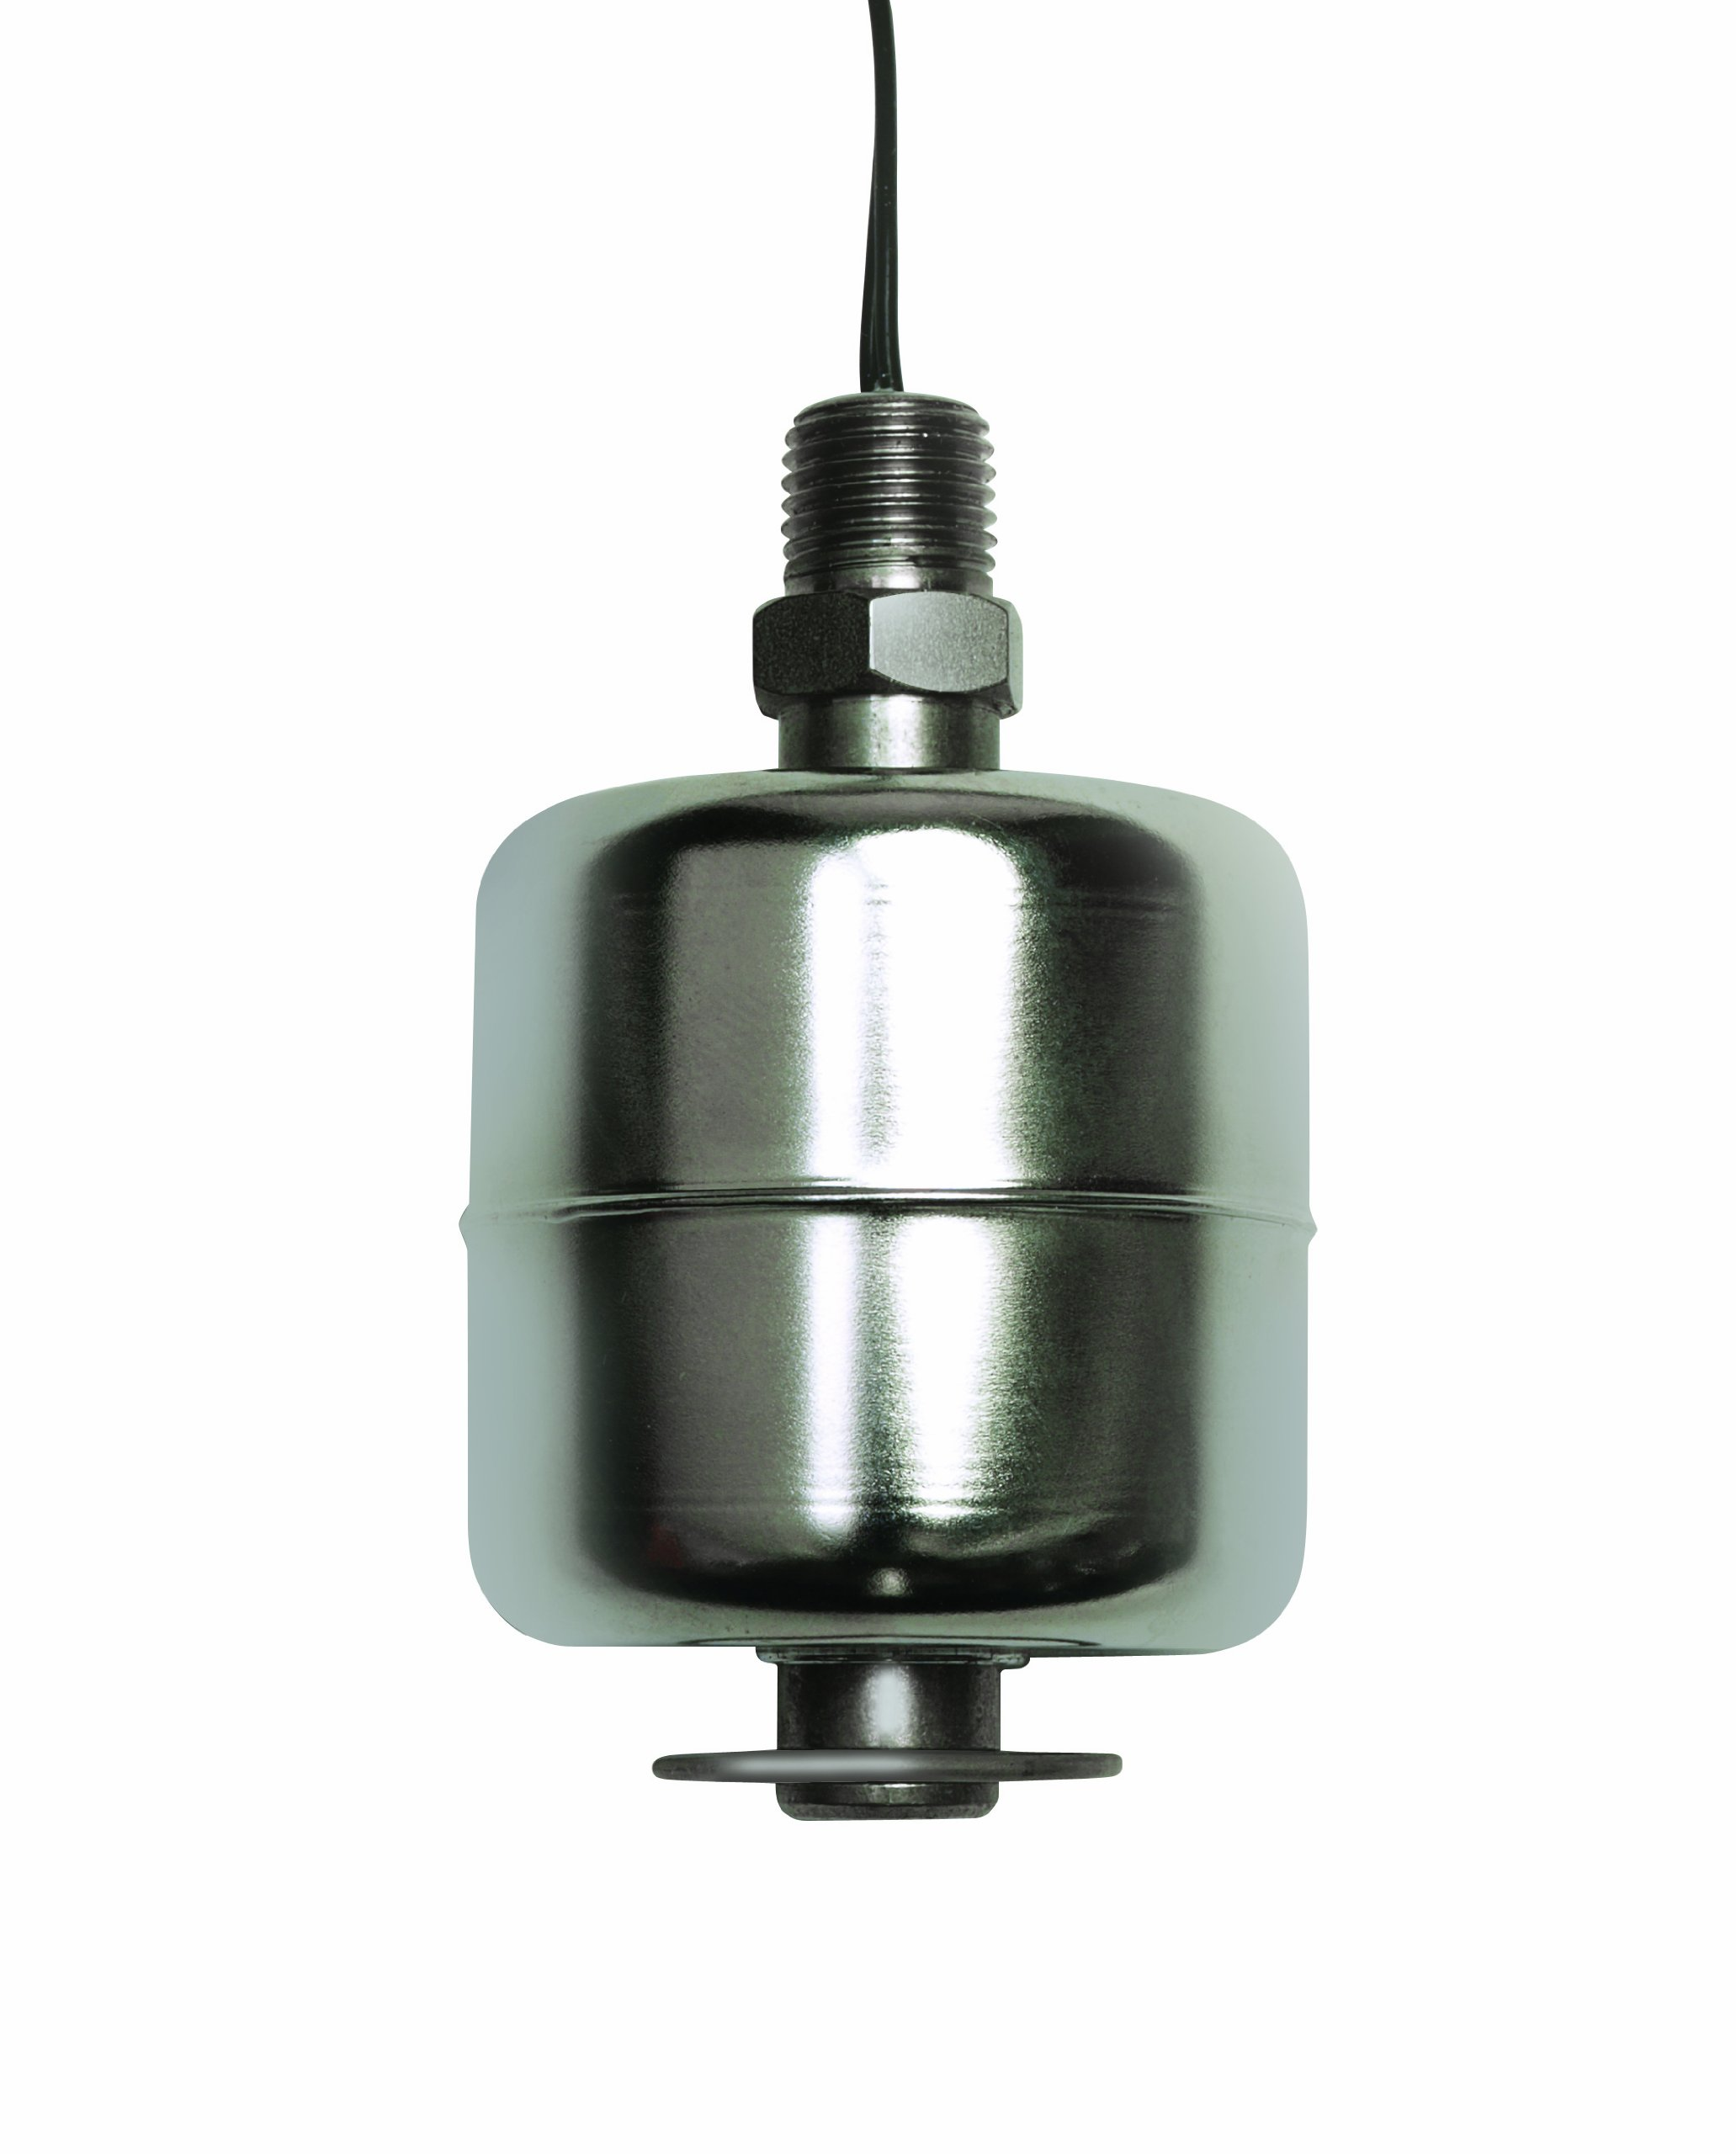 Madison M5600 316 Stainless Steel Full Size Liquid Level Switch with Stem, 60 VA SPST, 1/4 NPT, 200 psig Pressure